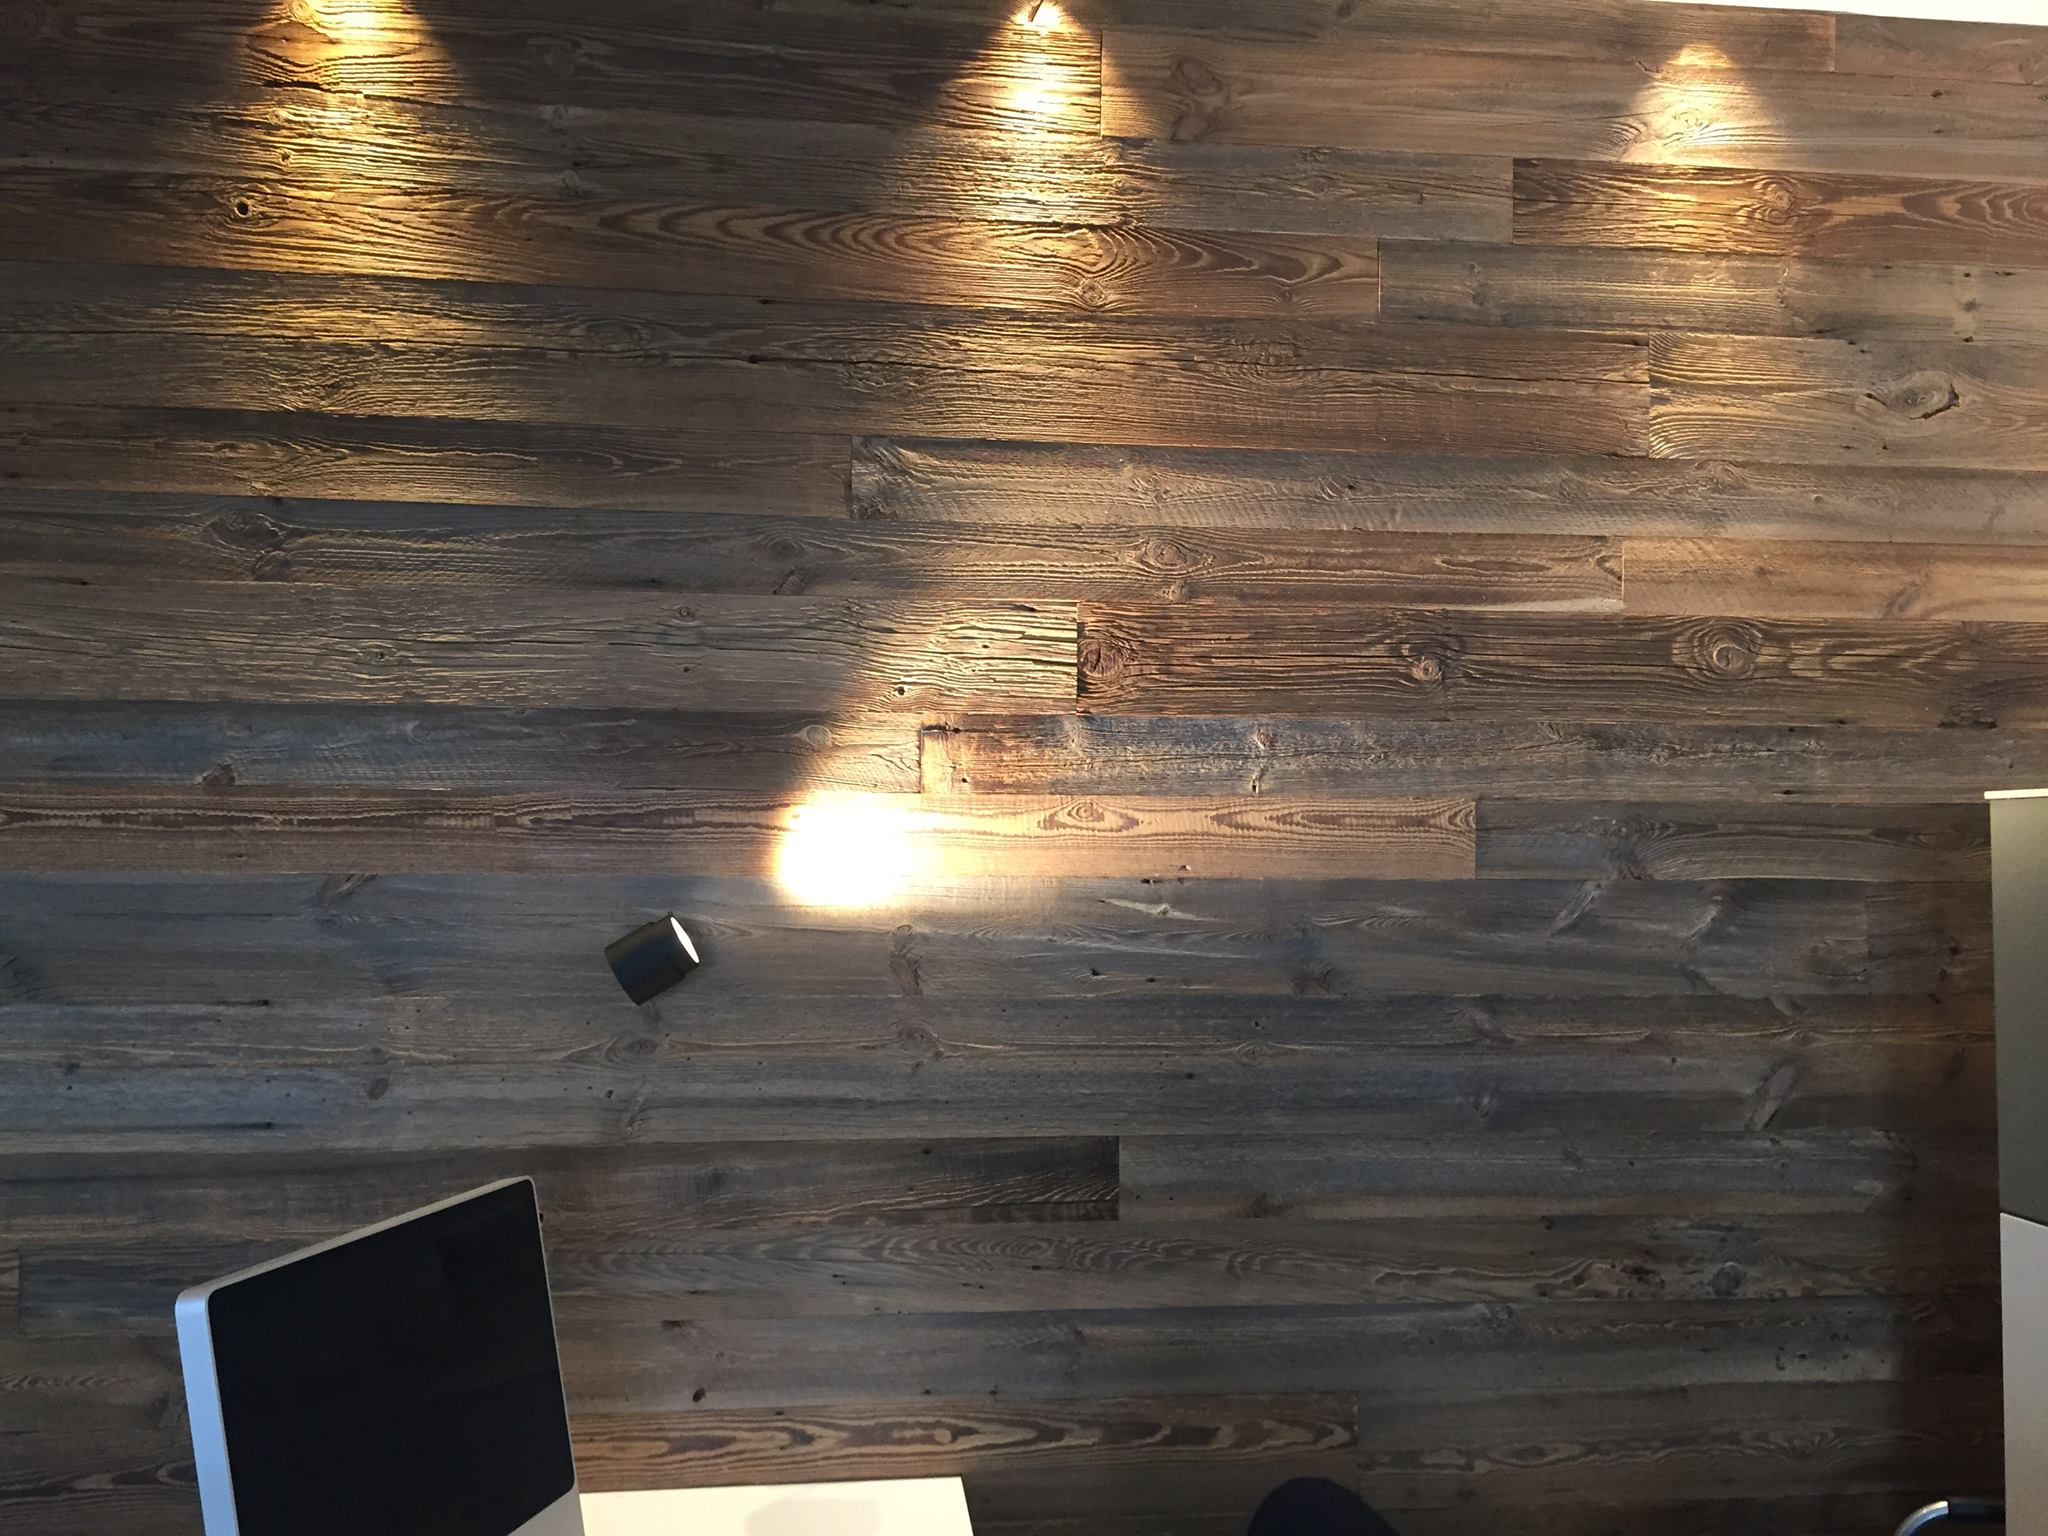 Wandverkleidung sonnenbrannt